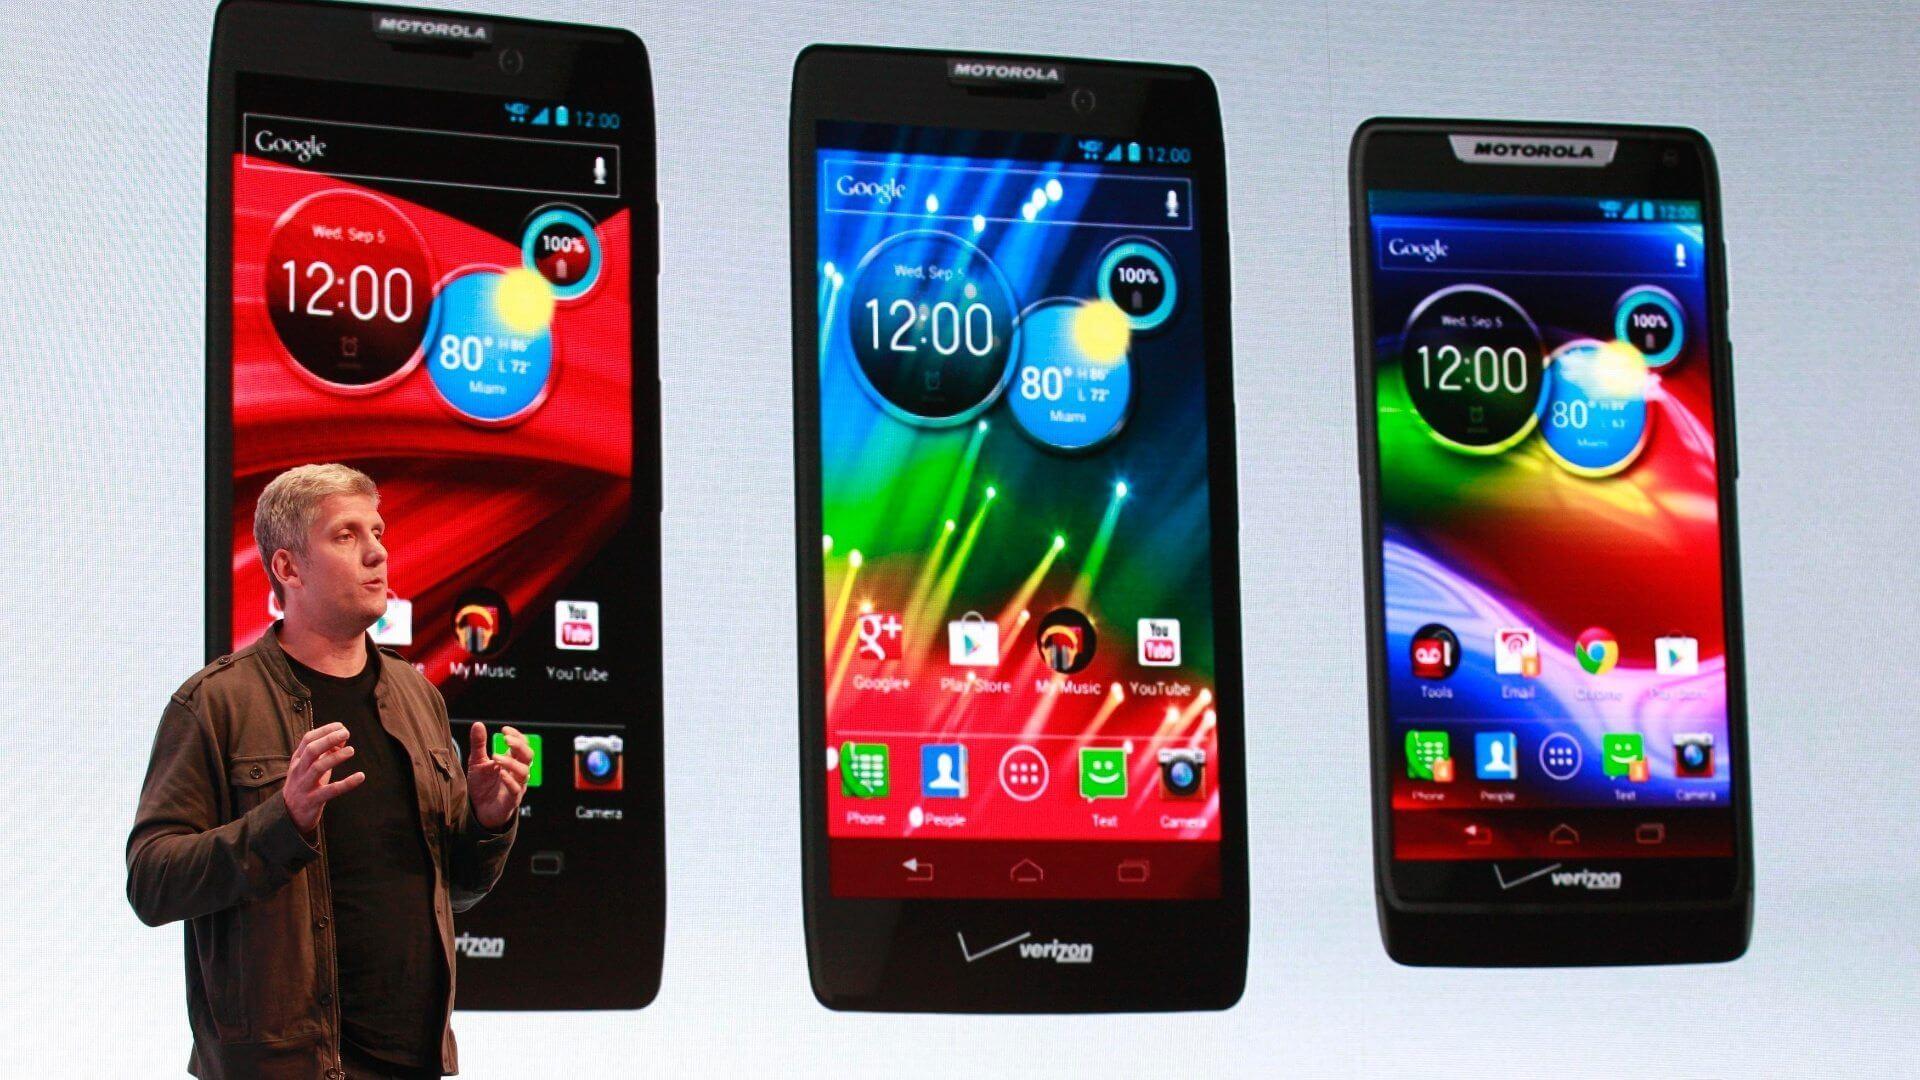 rickosterloh - Bola dividida: Executivo da Motorola diz que Samsung pode se tornar irrelevante